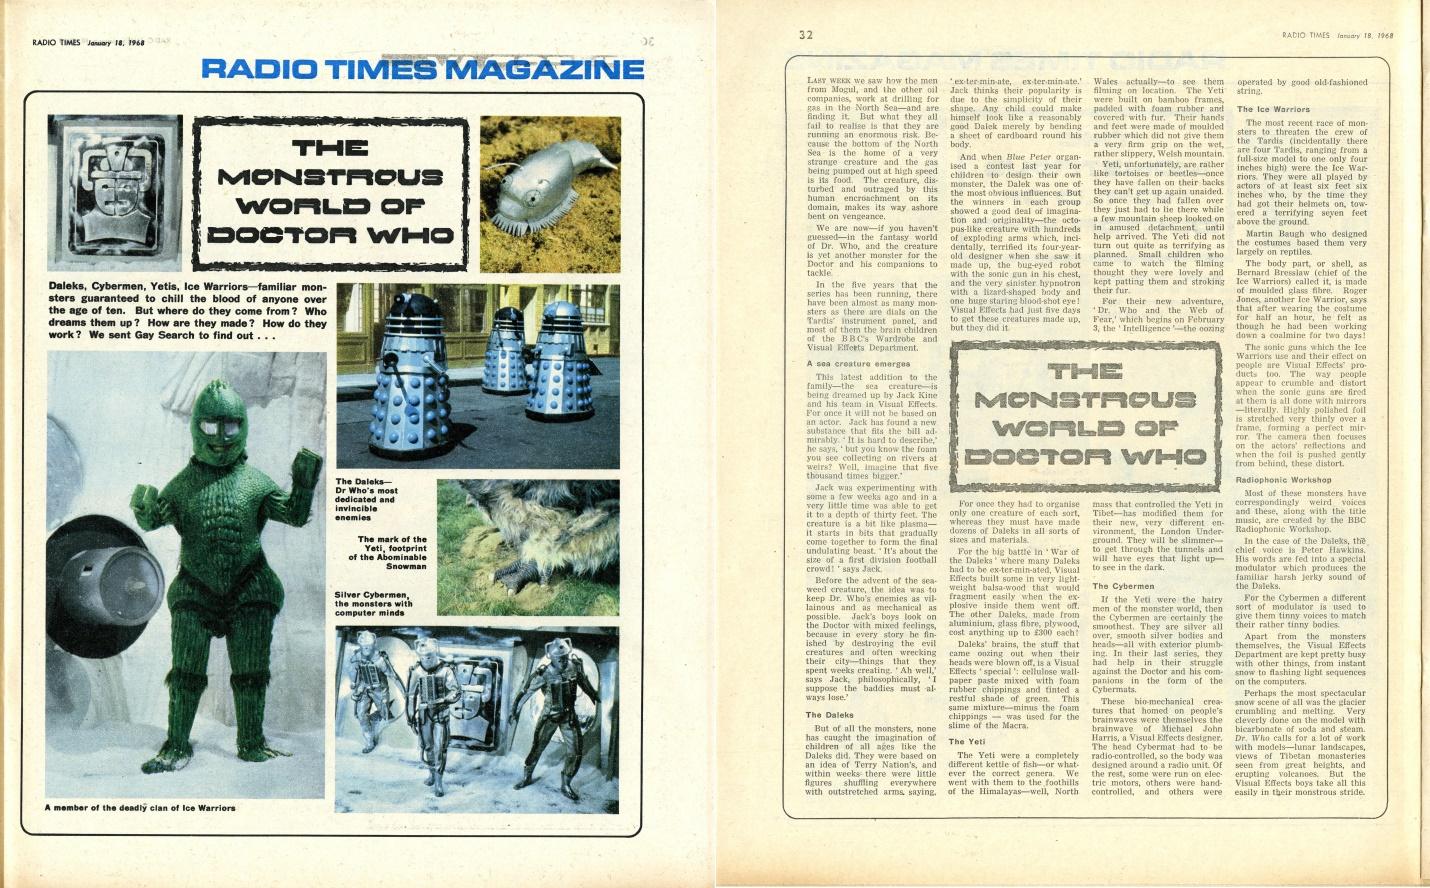 Radio Times, 20-26 January 1968